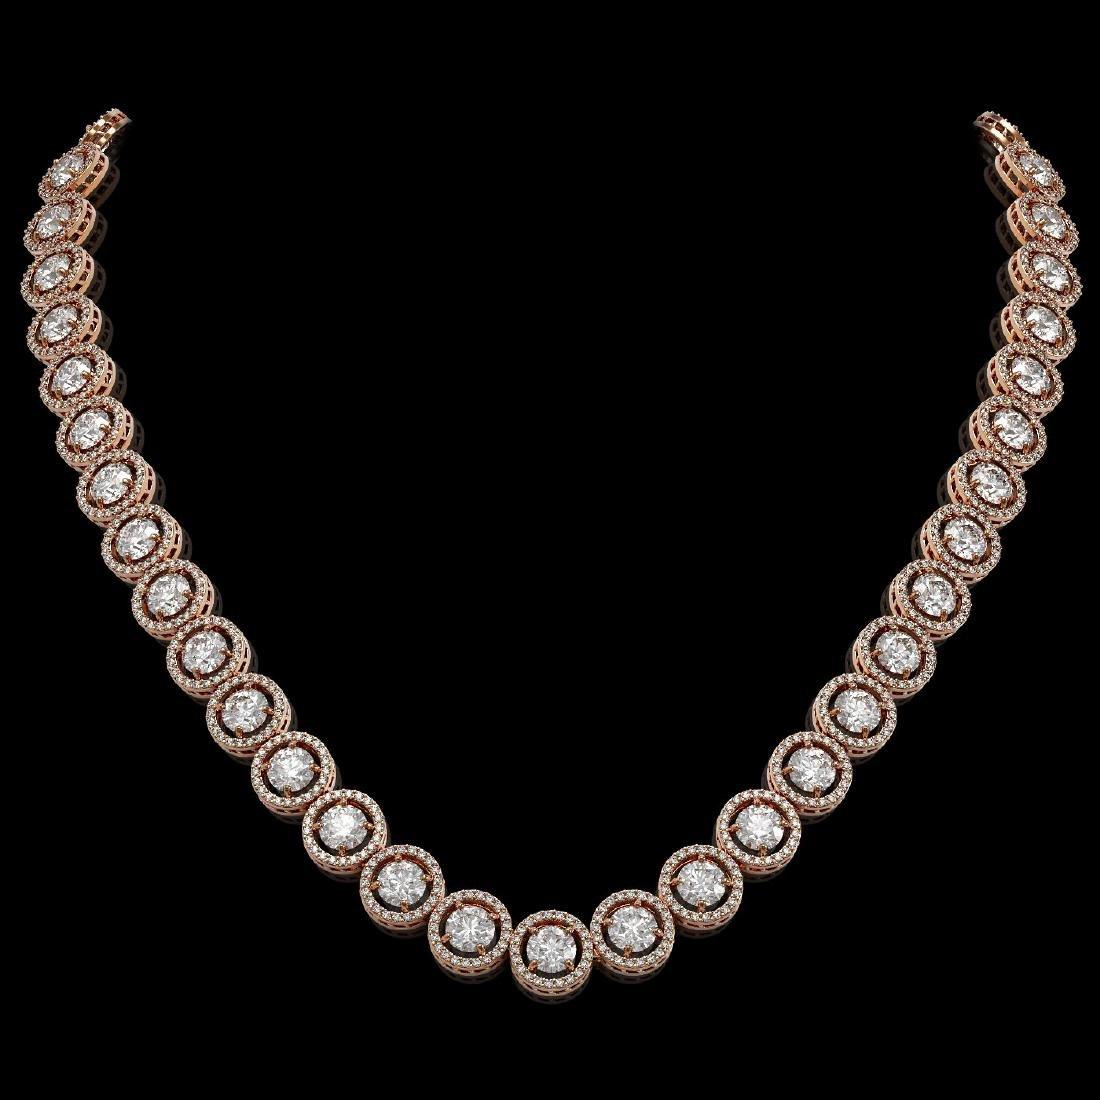 30.78 CTW Diamond Designer Necklace 18K Rose Gold